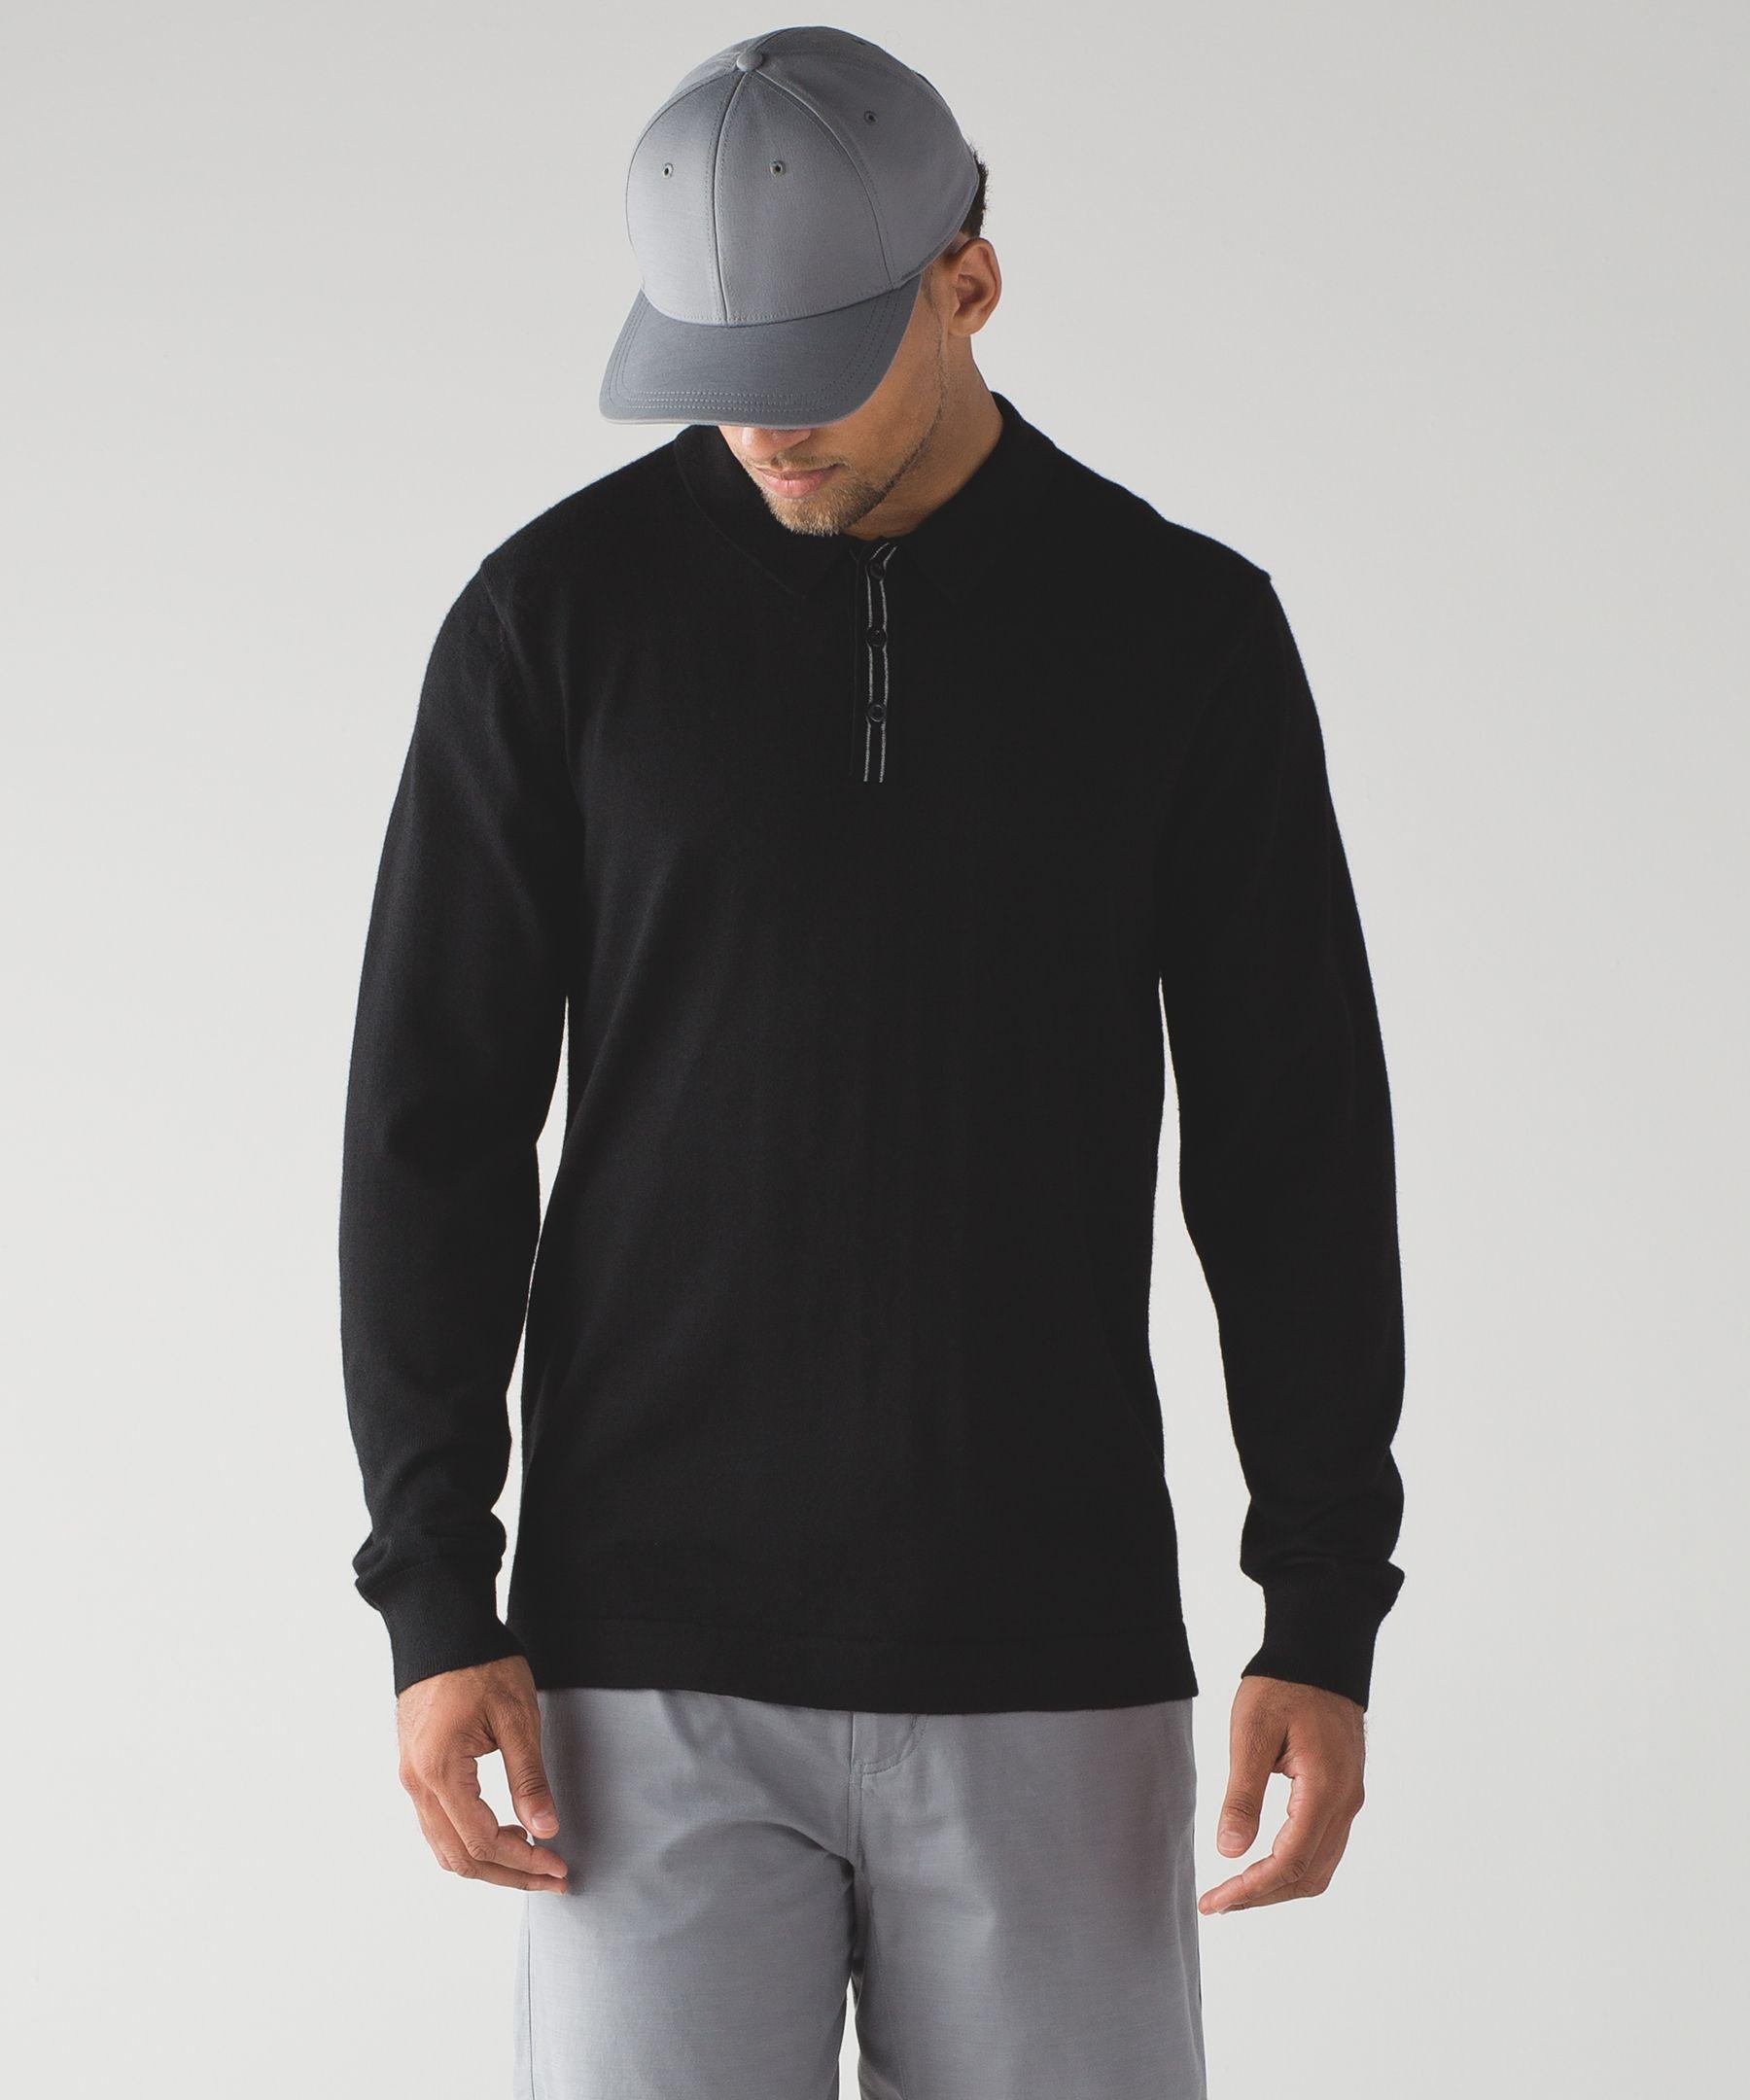 Techwool Long Sleeve Polo